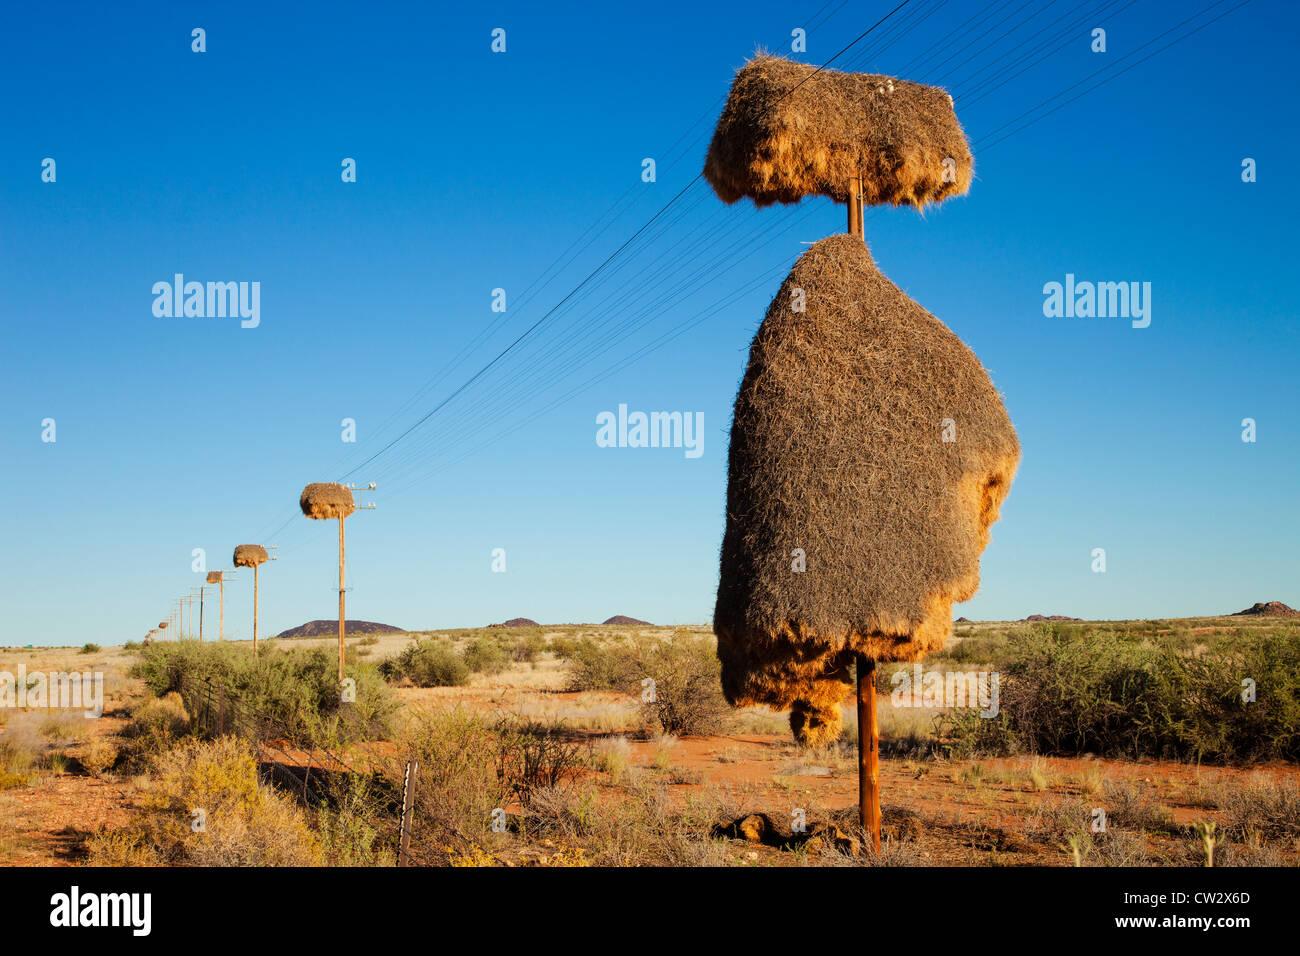 Gesellig Weaver Nest (Philetairus Socius) machte auf einen Telefonmast. Namibia Stockbild